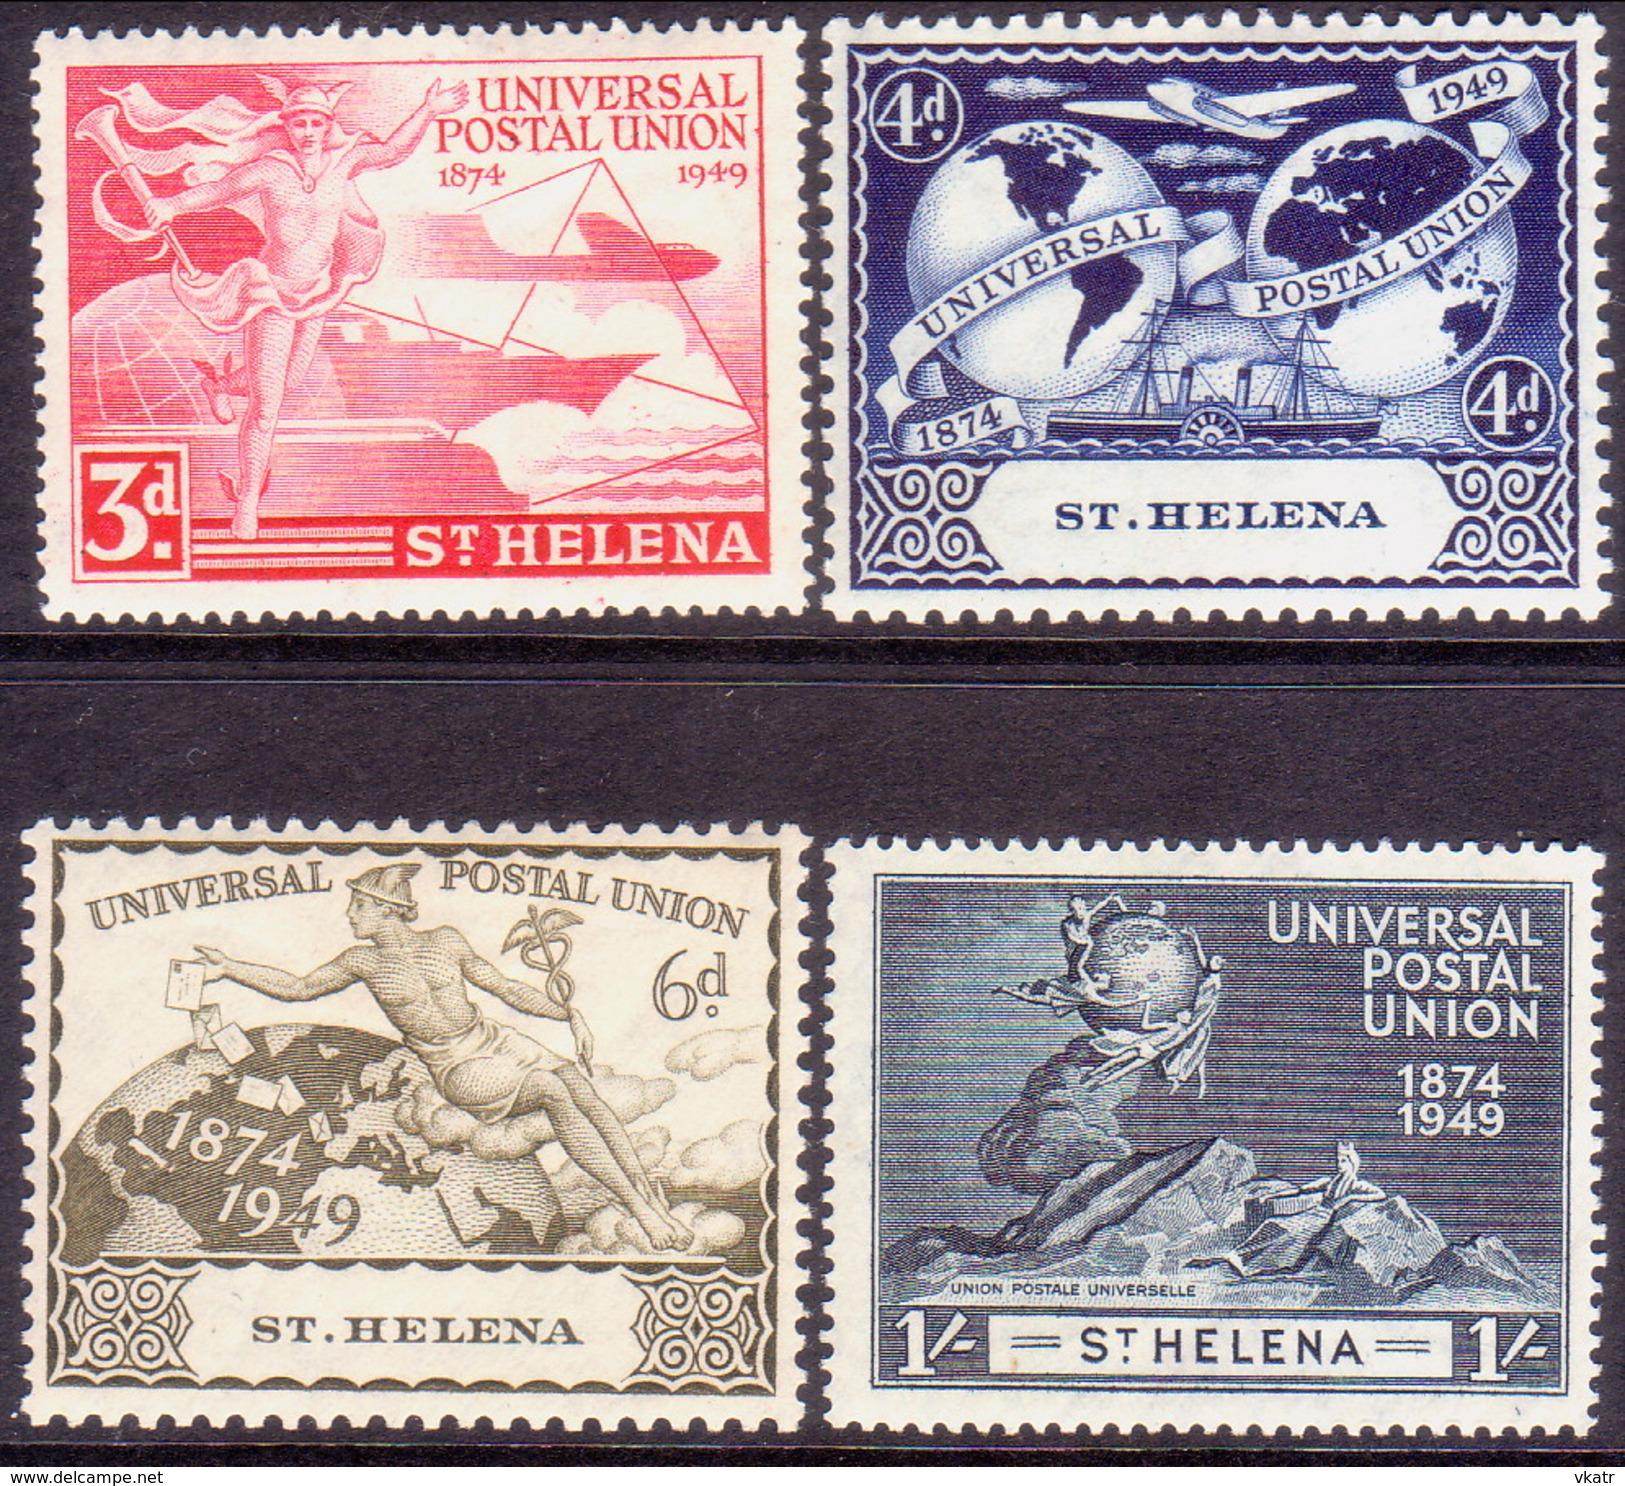 ST HELENA 1949 SG #145-48 Compl.set MH UPU Centenary Light Crease On 3d Not Seen On Front - Saint Helena Island